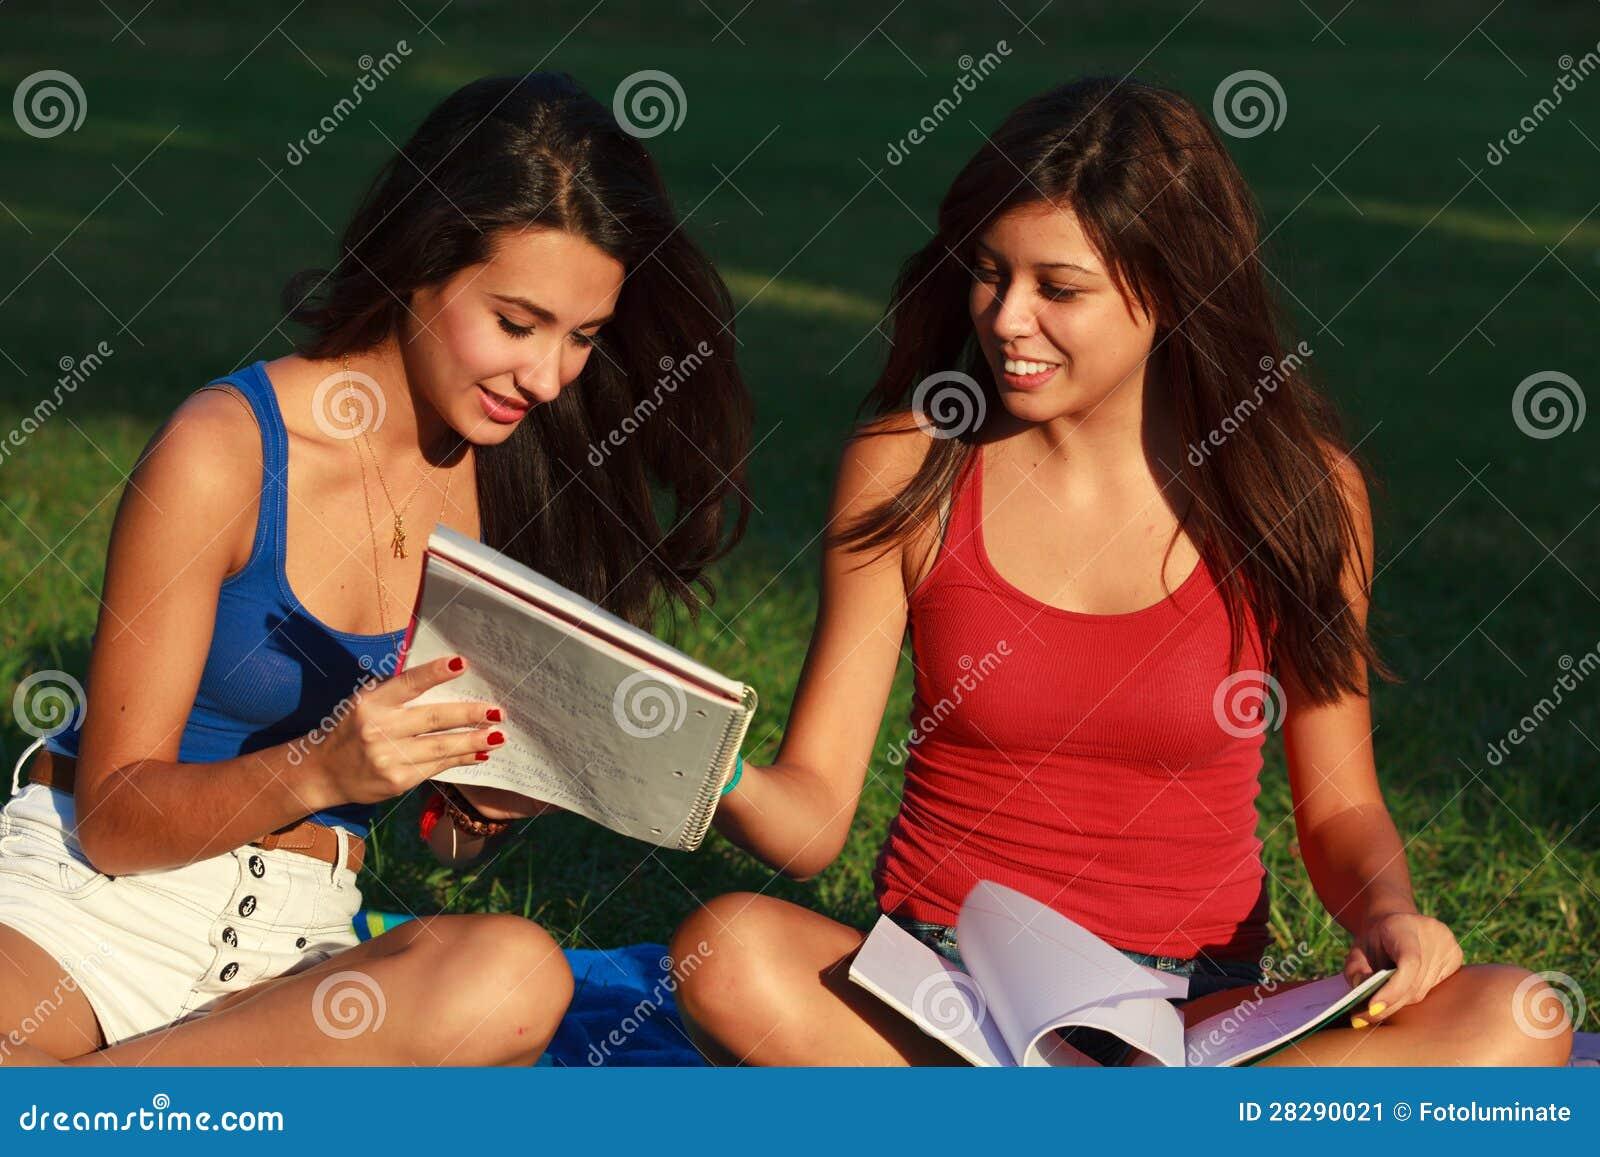 Beautiful college girls